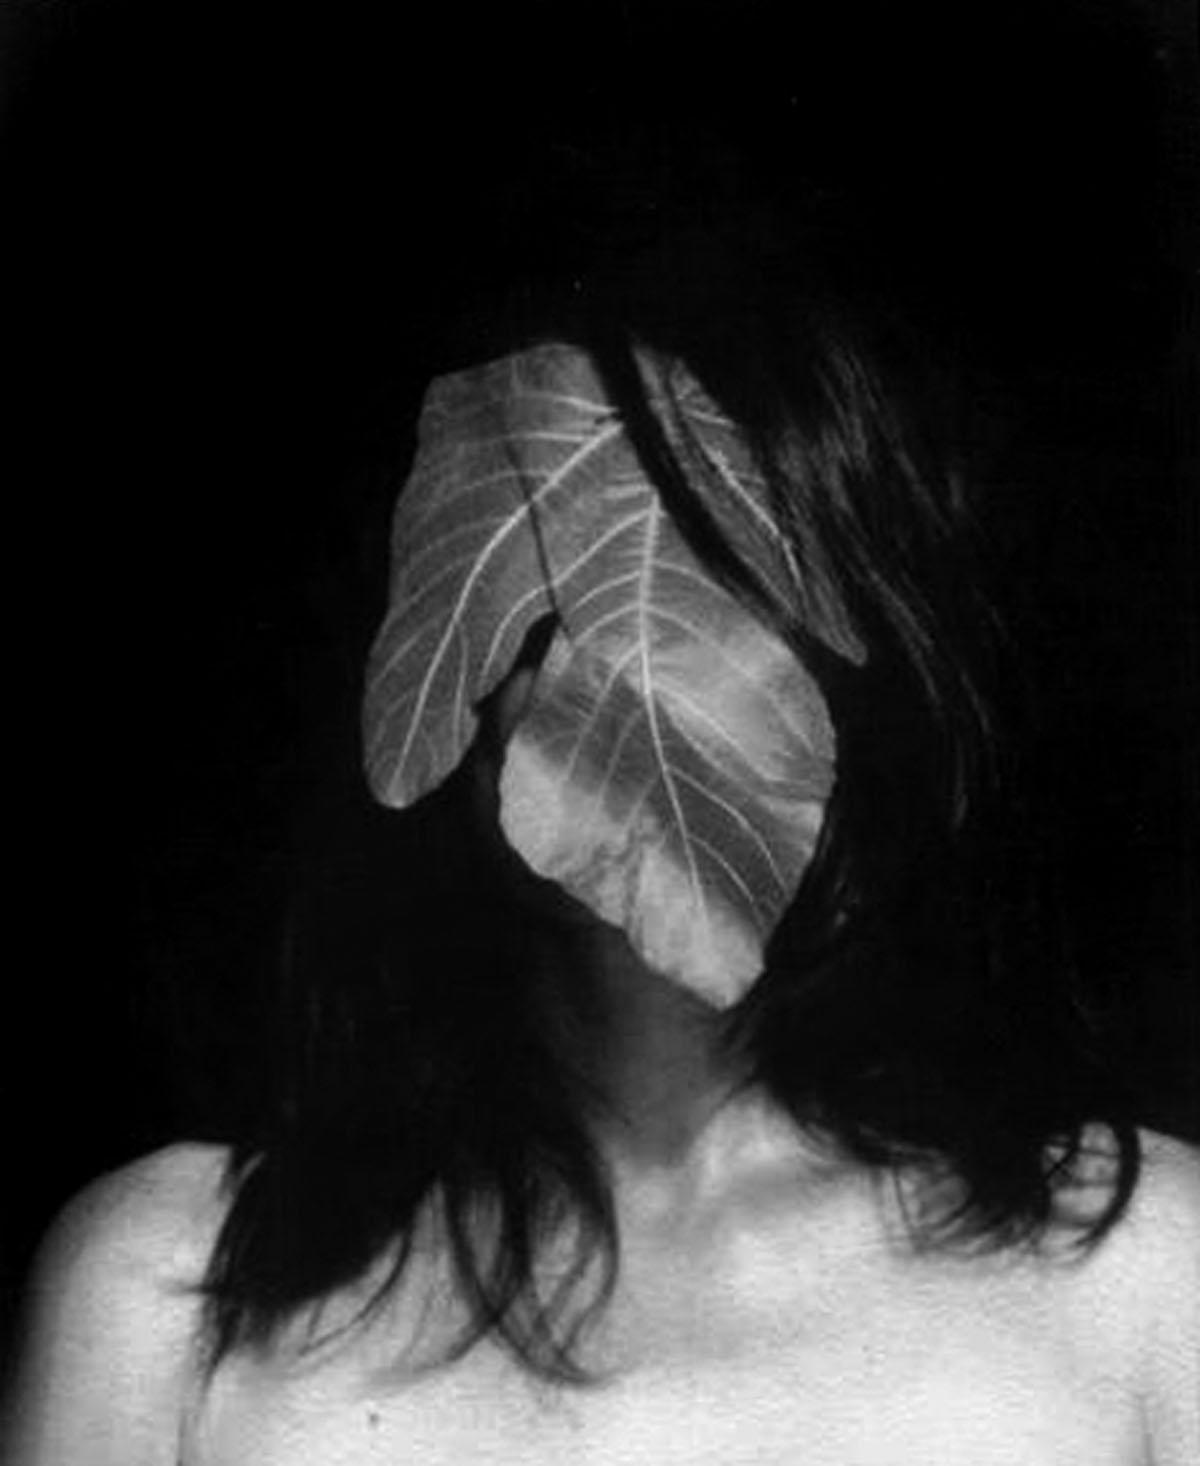 Marie Denis, Photomaton, 2014, stampa bianconero su cotone, 27.5x21 cm, courtesy Galerie Alberta Pane, Parigi